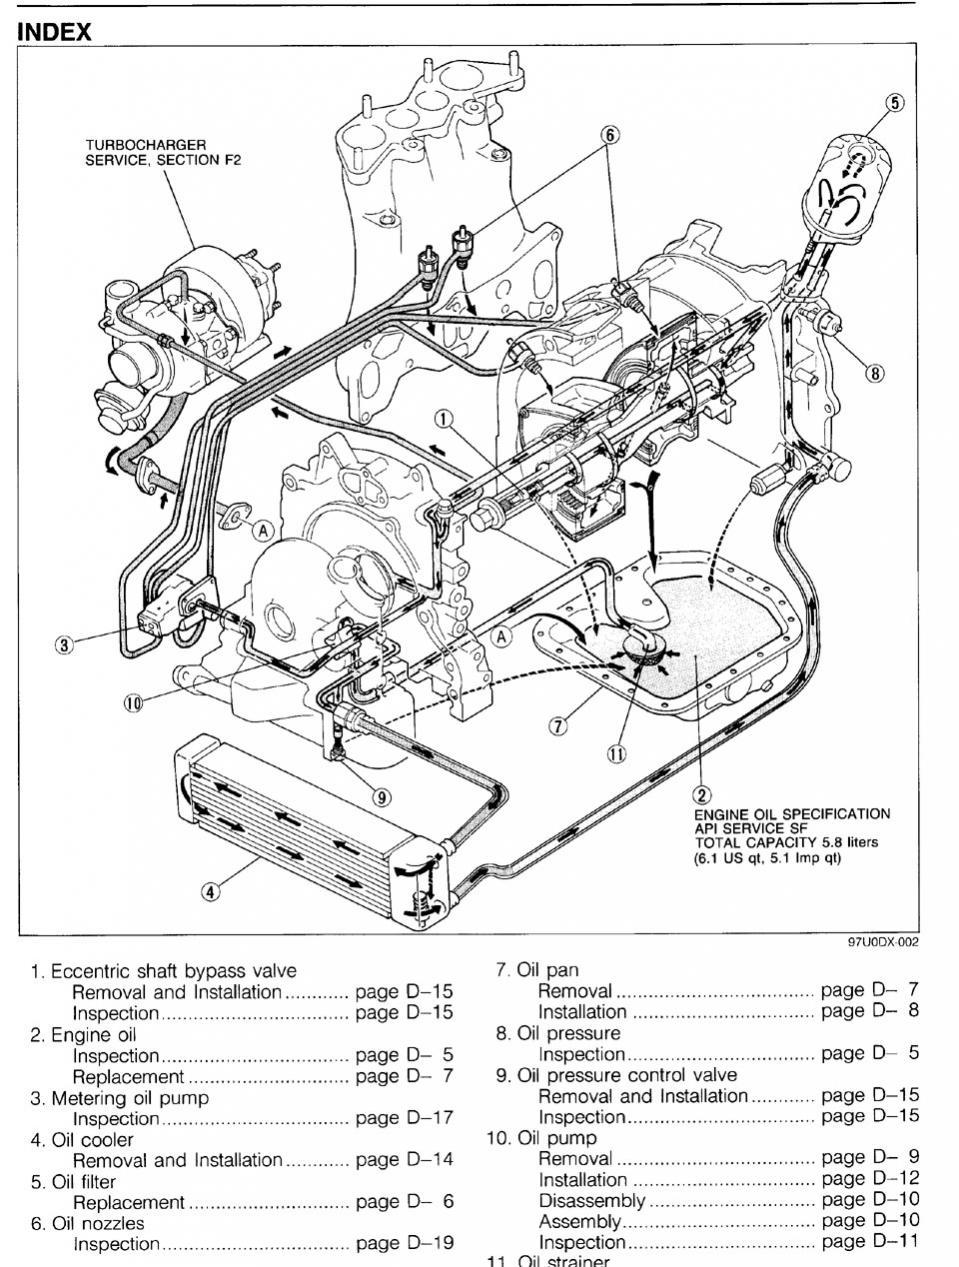 medium resolution of external oil line line loop oil modification rx7club com mazda rh rx7club com rx 8 oil line diagram jeep grand cherokee diagrams